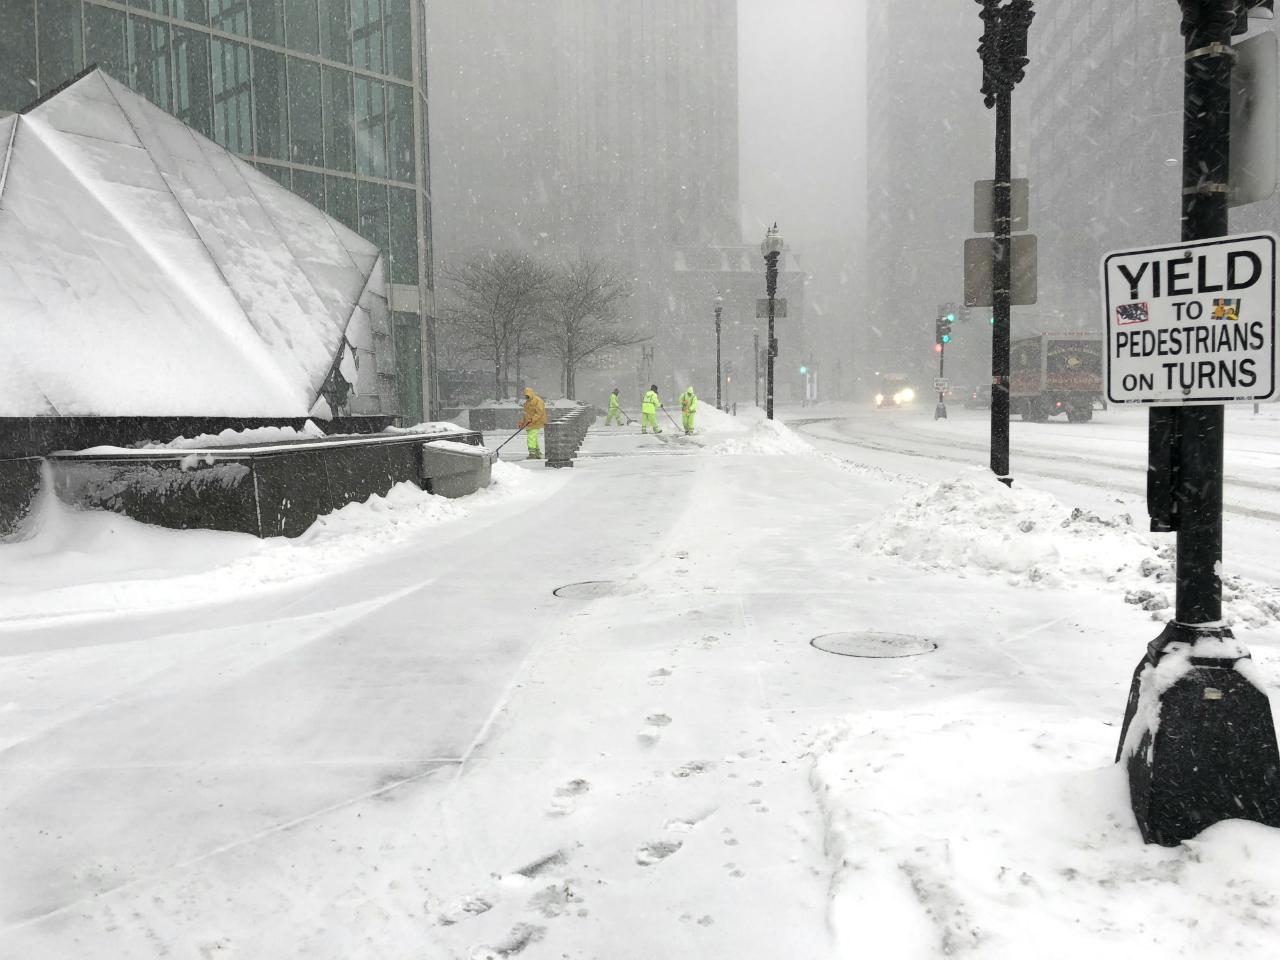 south-station-shoveling1.jpg